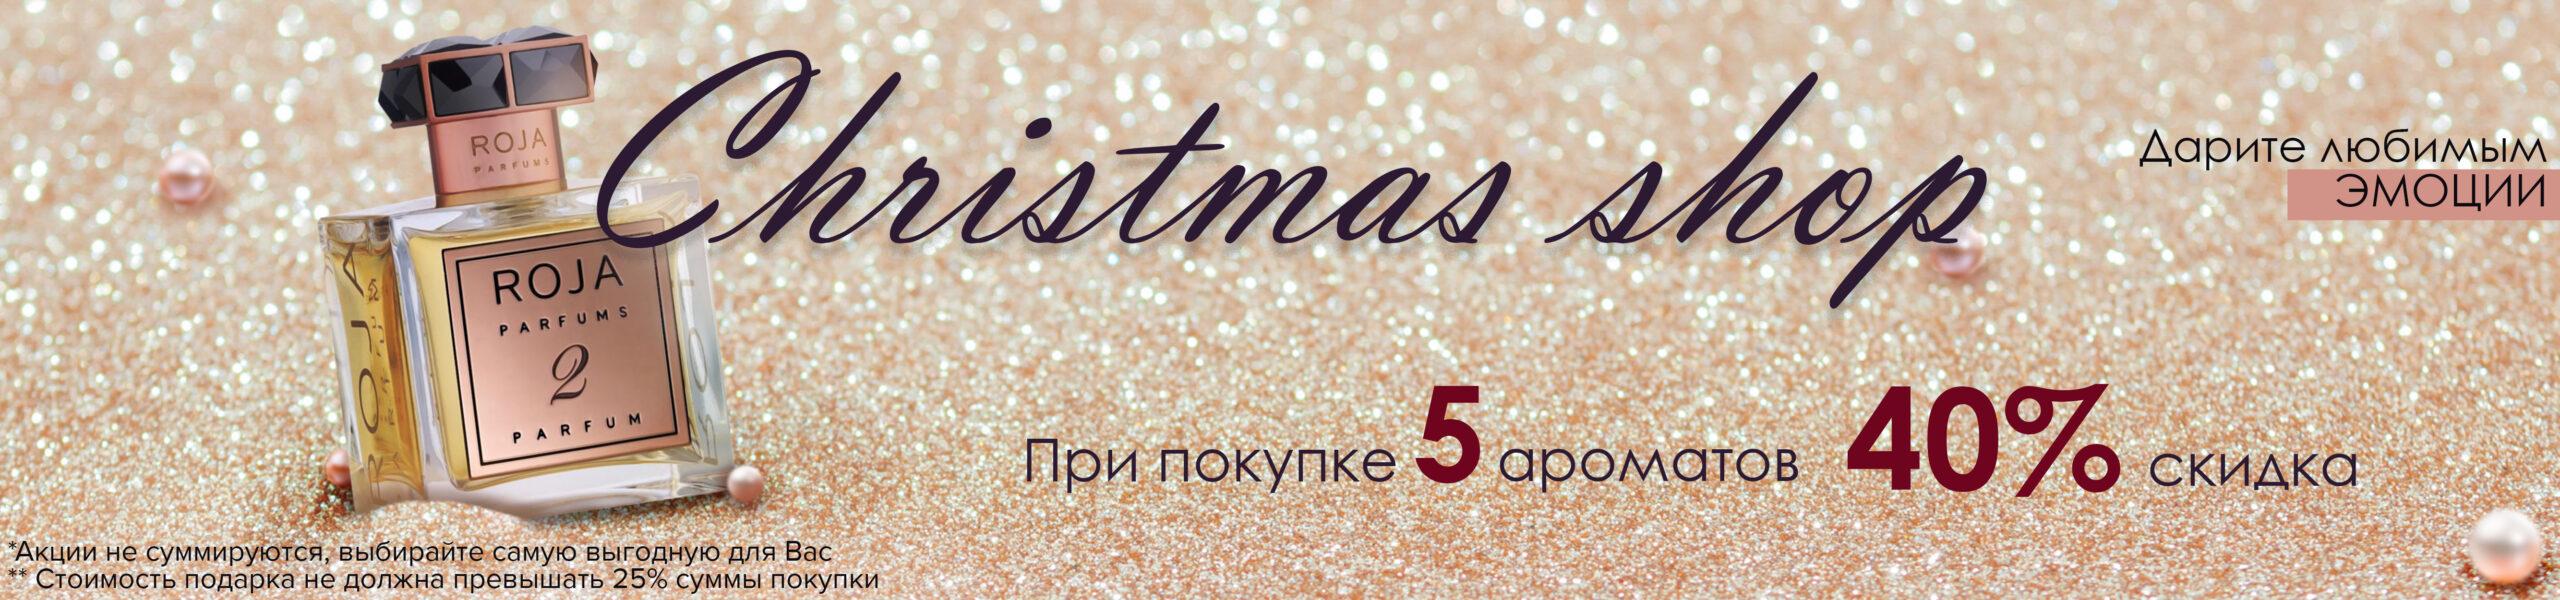 Christmas shop sale 40%